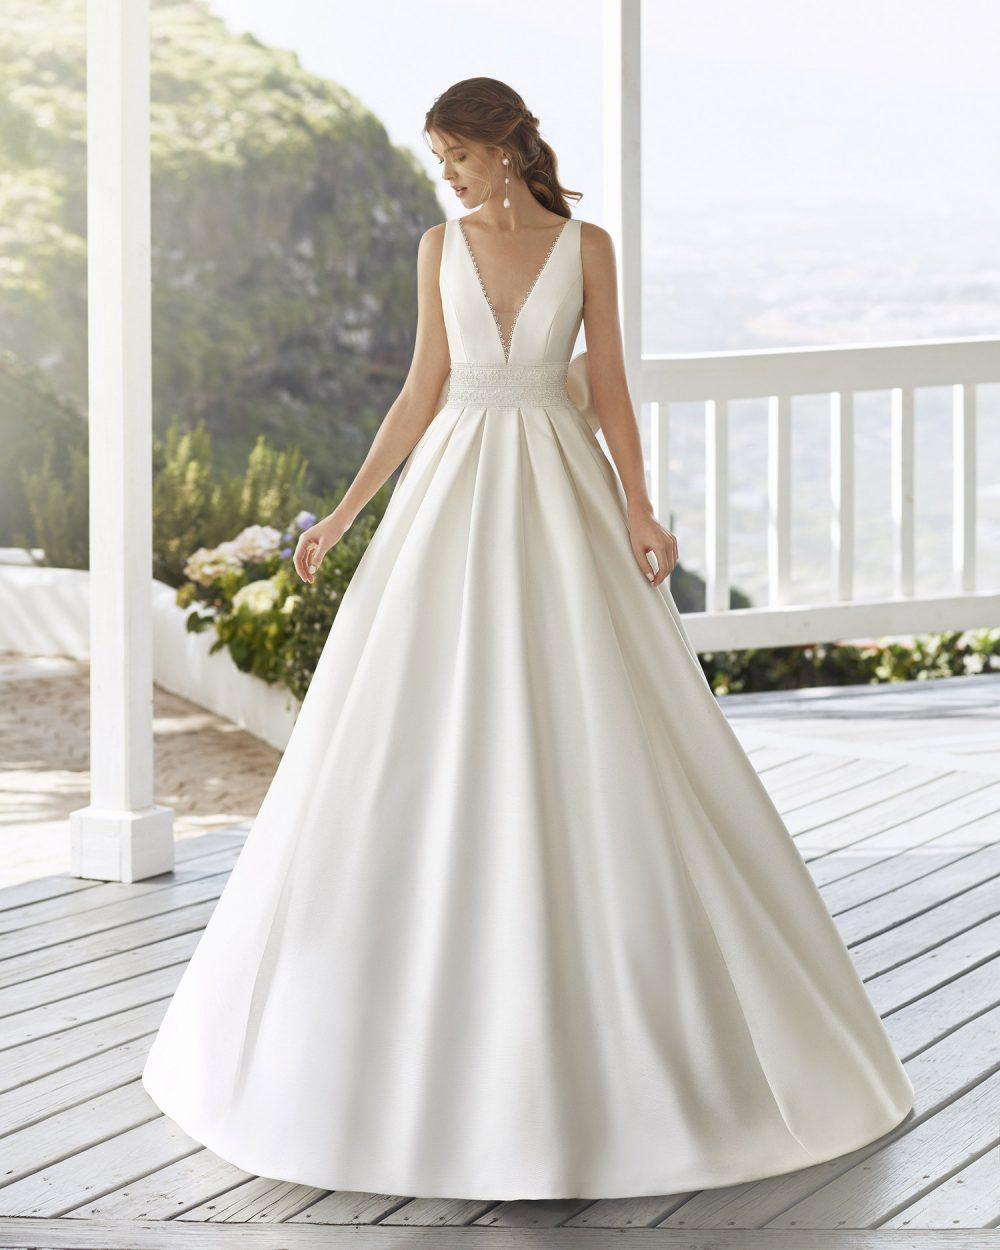 Mariages: abito da sposa Rosa Clarà 2021 a Vicenza, Verona, Padova, Veneto 4A1E1 CABAK